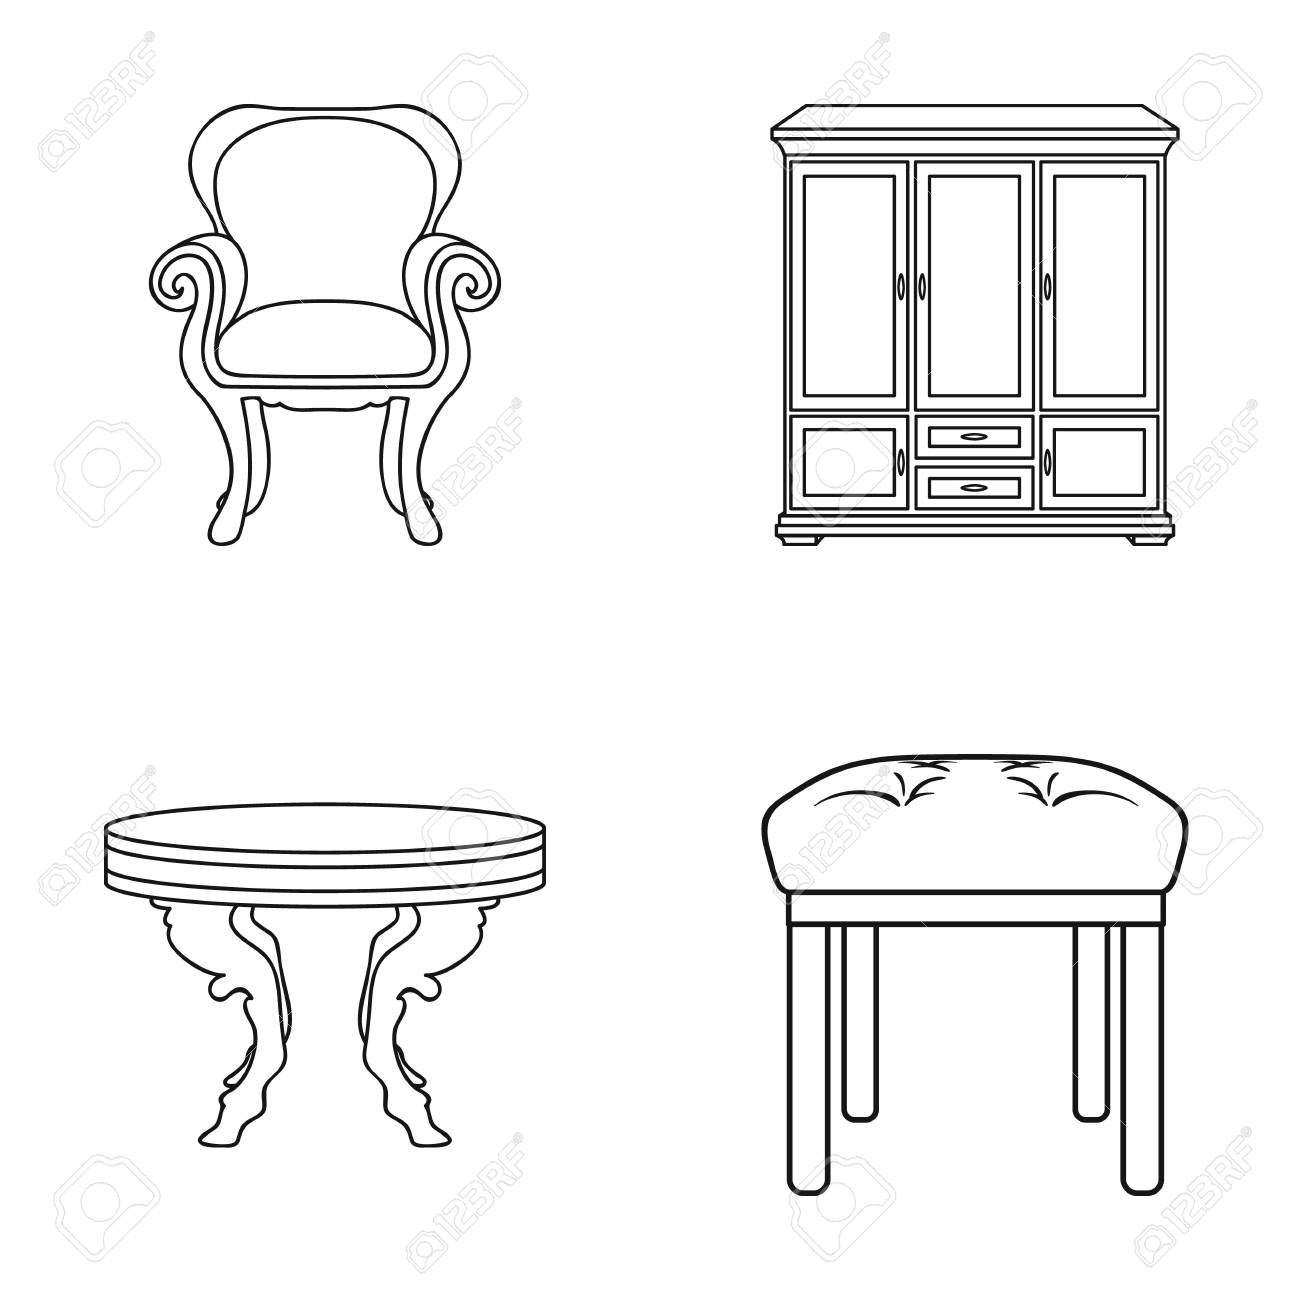 Icon Bar Stool House Plans on chairs icon, bar shelf icon, furniture icon, fireplace icon, books icon, snowflake icon, bar soap icon, leather icon, table icon, console icon,